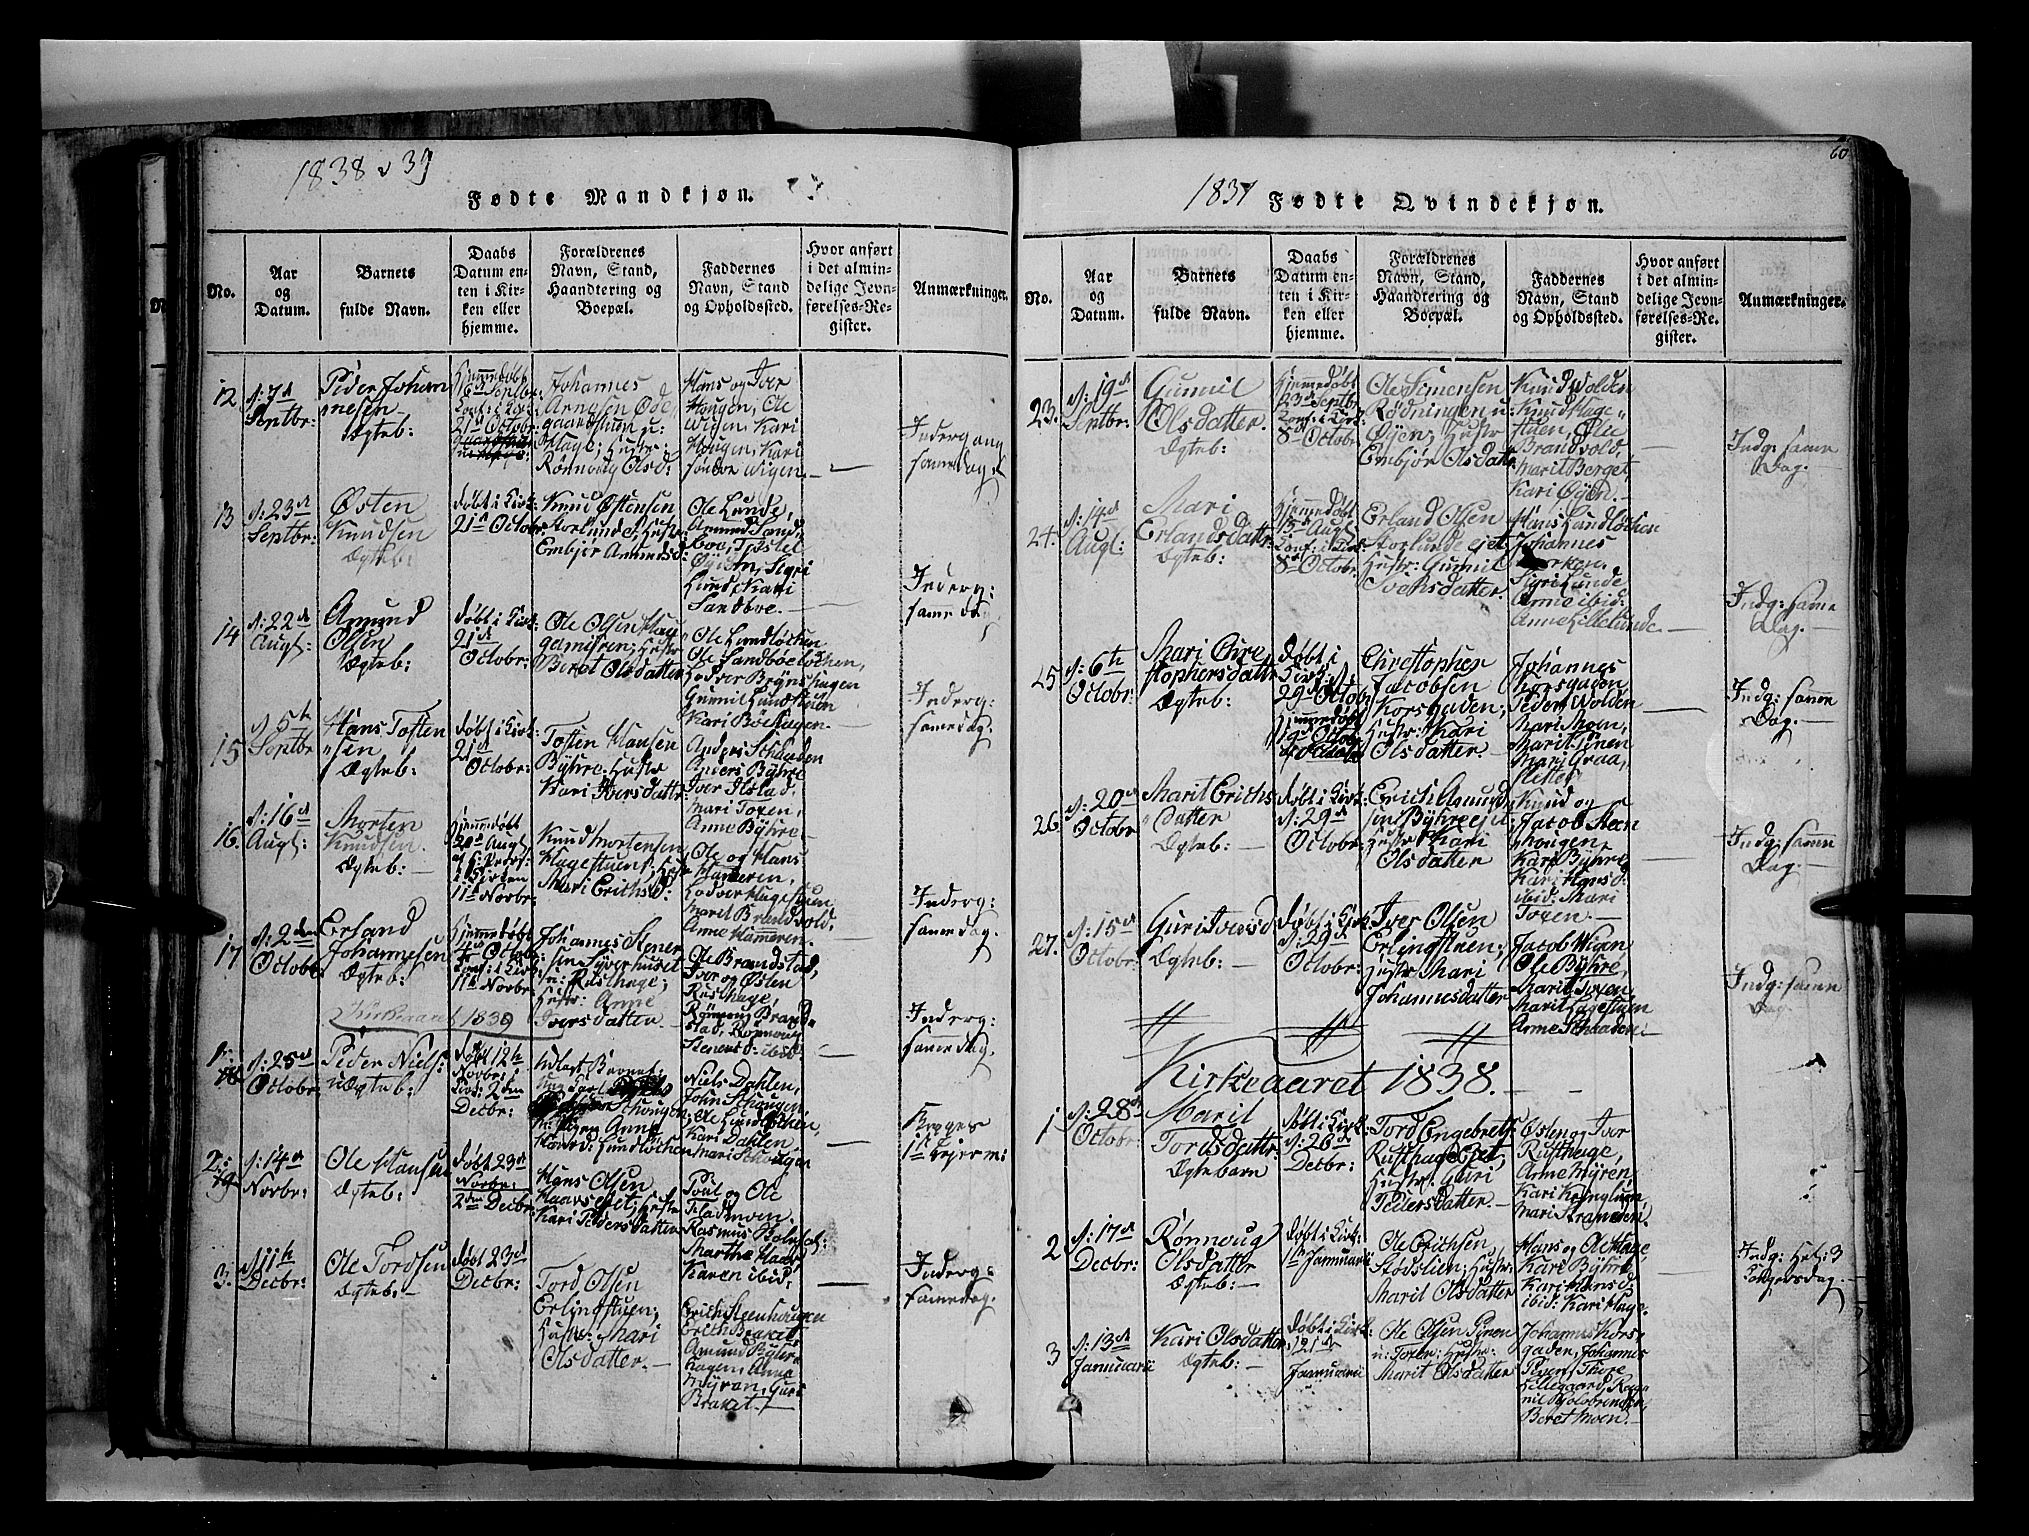 SAH, Fron prestekontor, H/Ha/Hab/L0004: Klokkerbok nr. 4, 1816-1850, s. 60